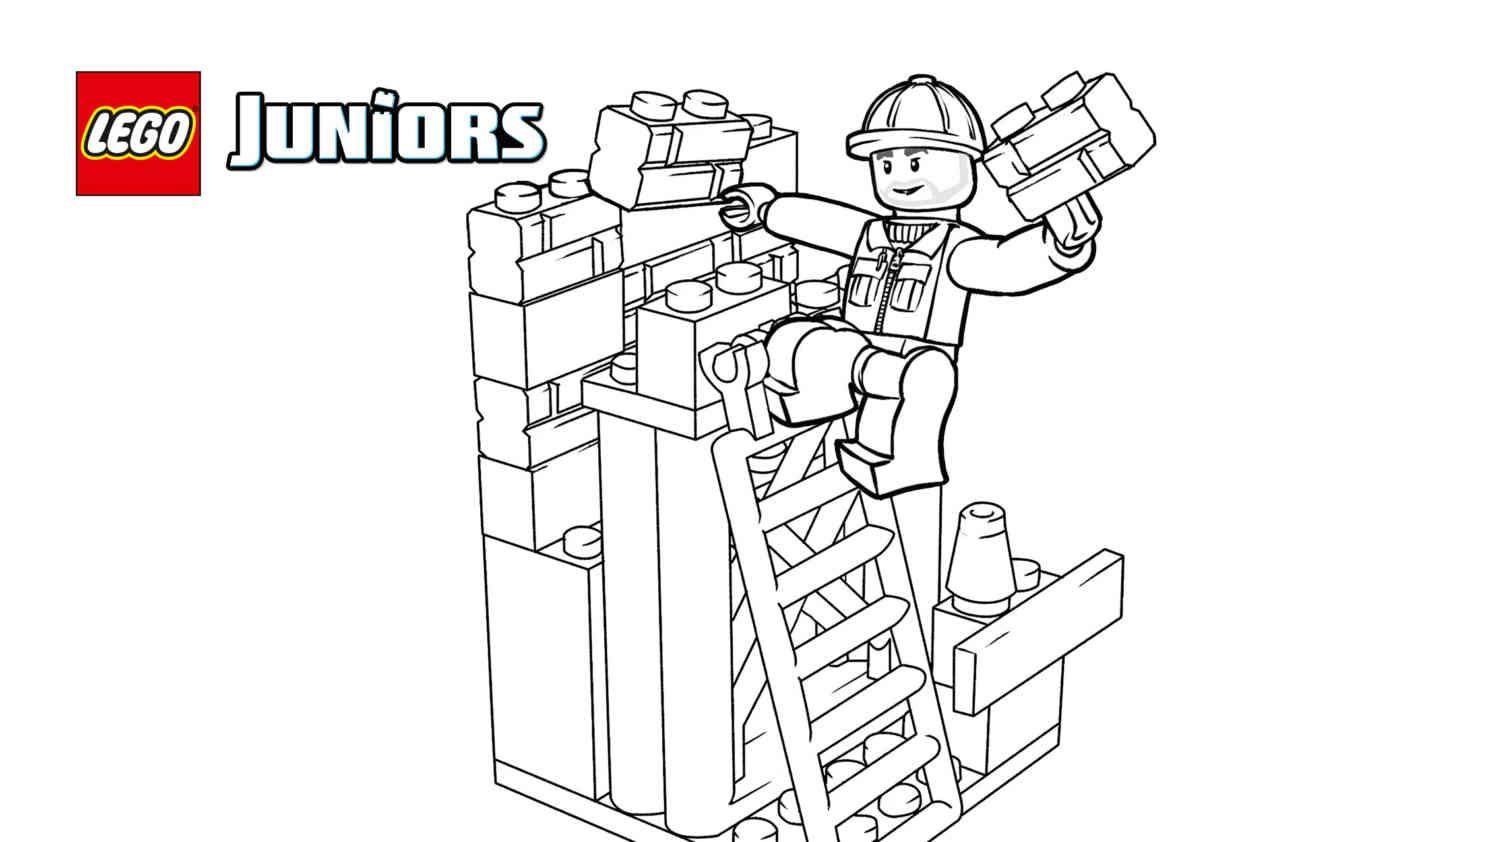 Lego 10667 Juniors Construction 5 Coloring Sheet Lego Coloring